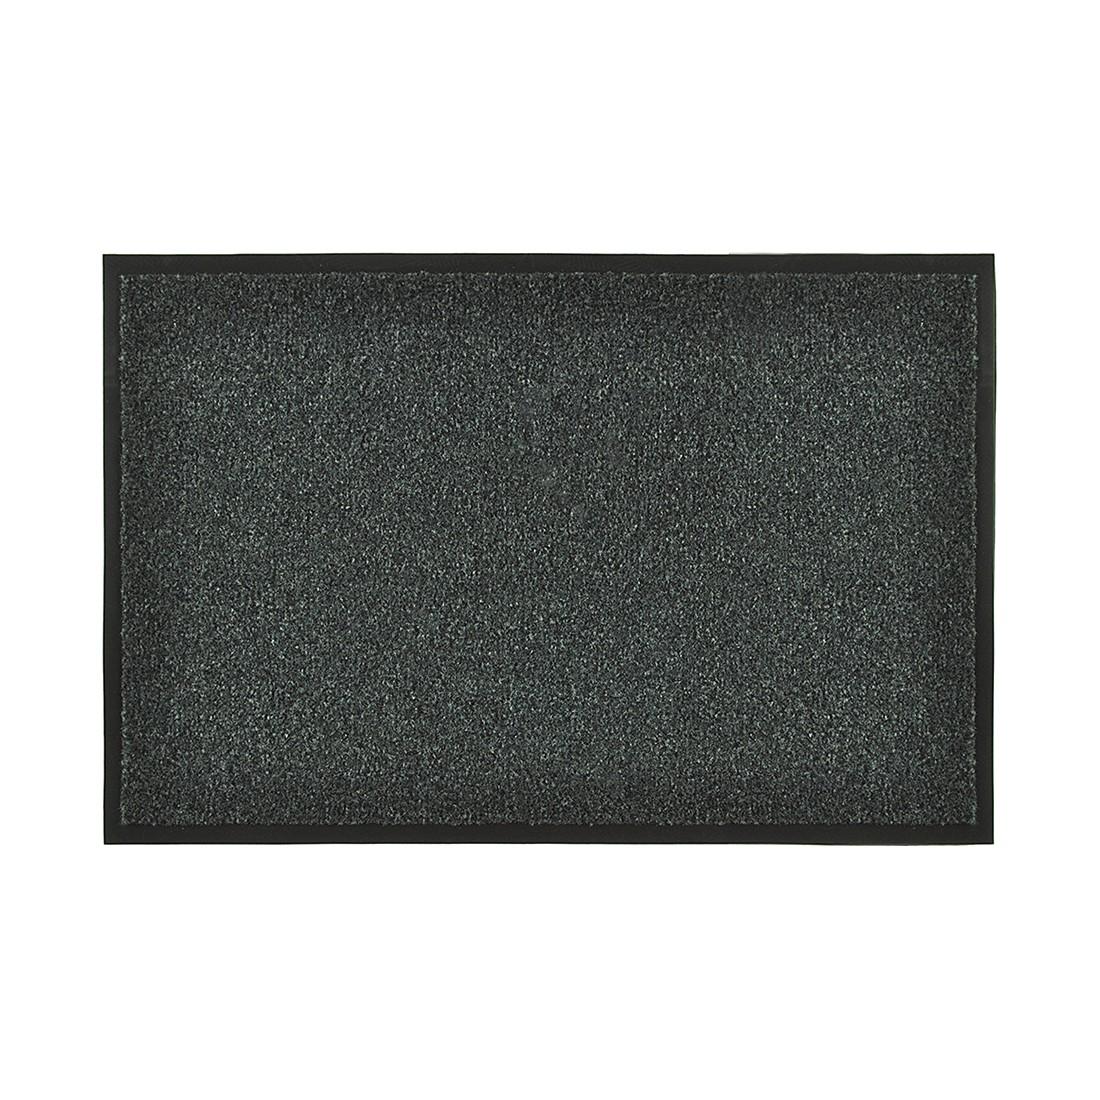 Fußmatte Green & Clean - Grau - 40 x 60 cm, Hanse Home Collection